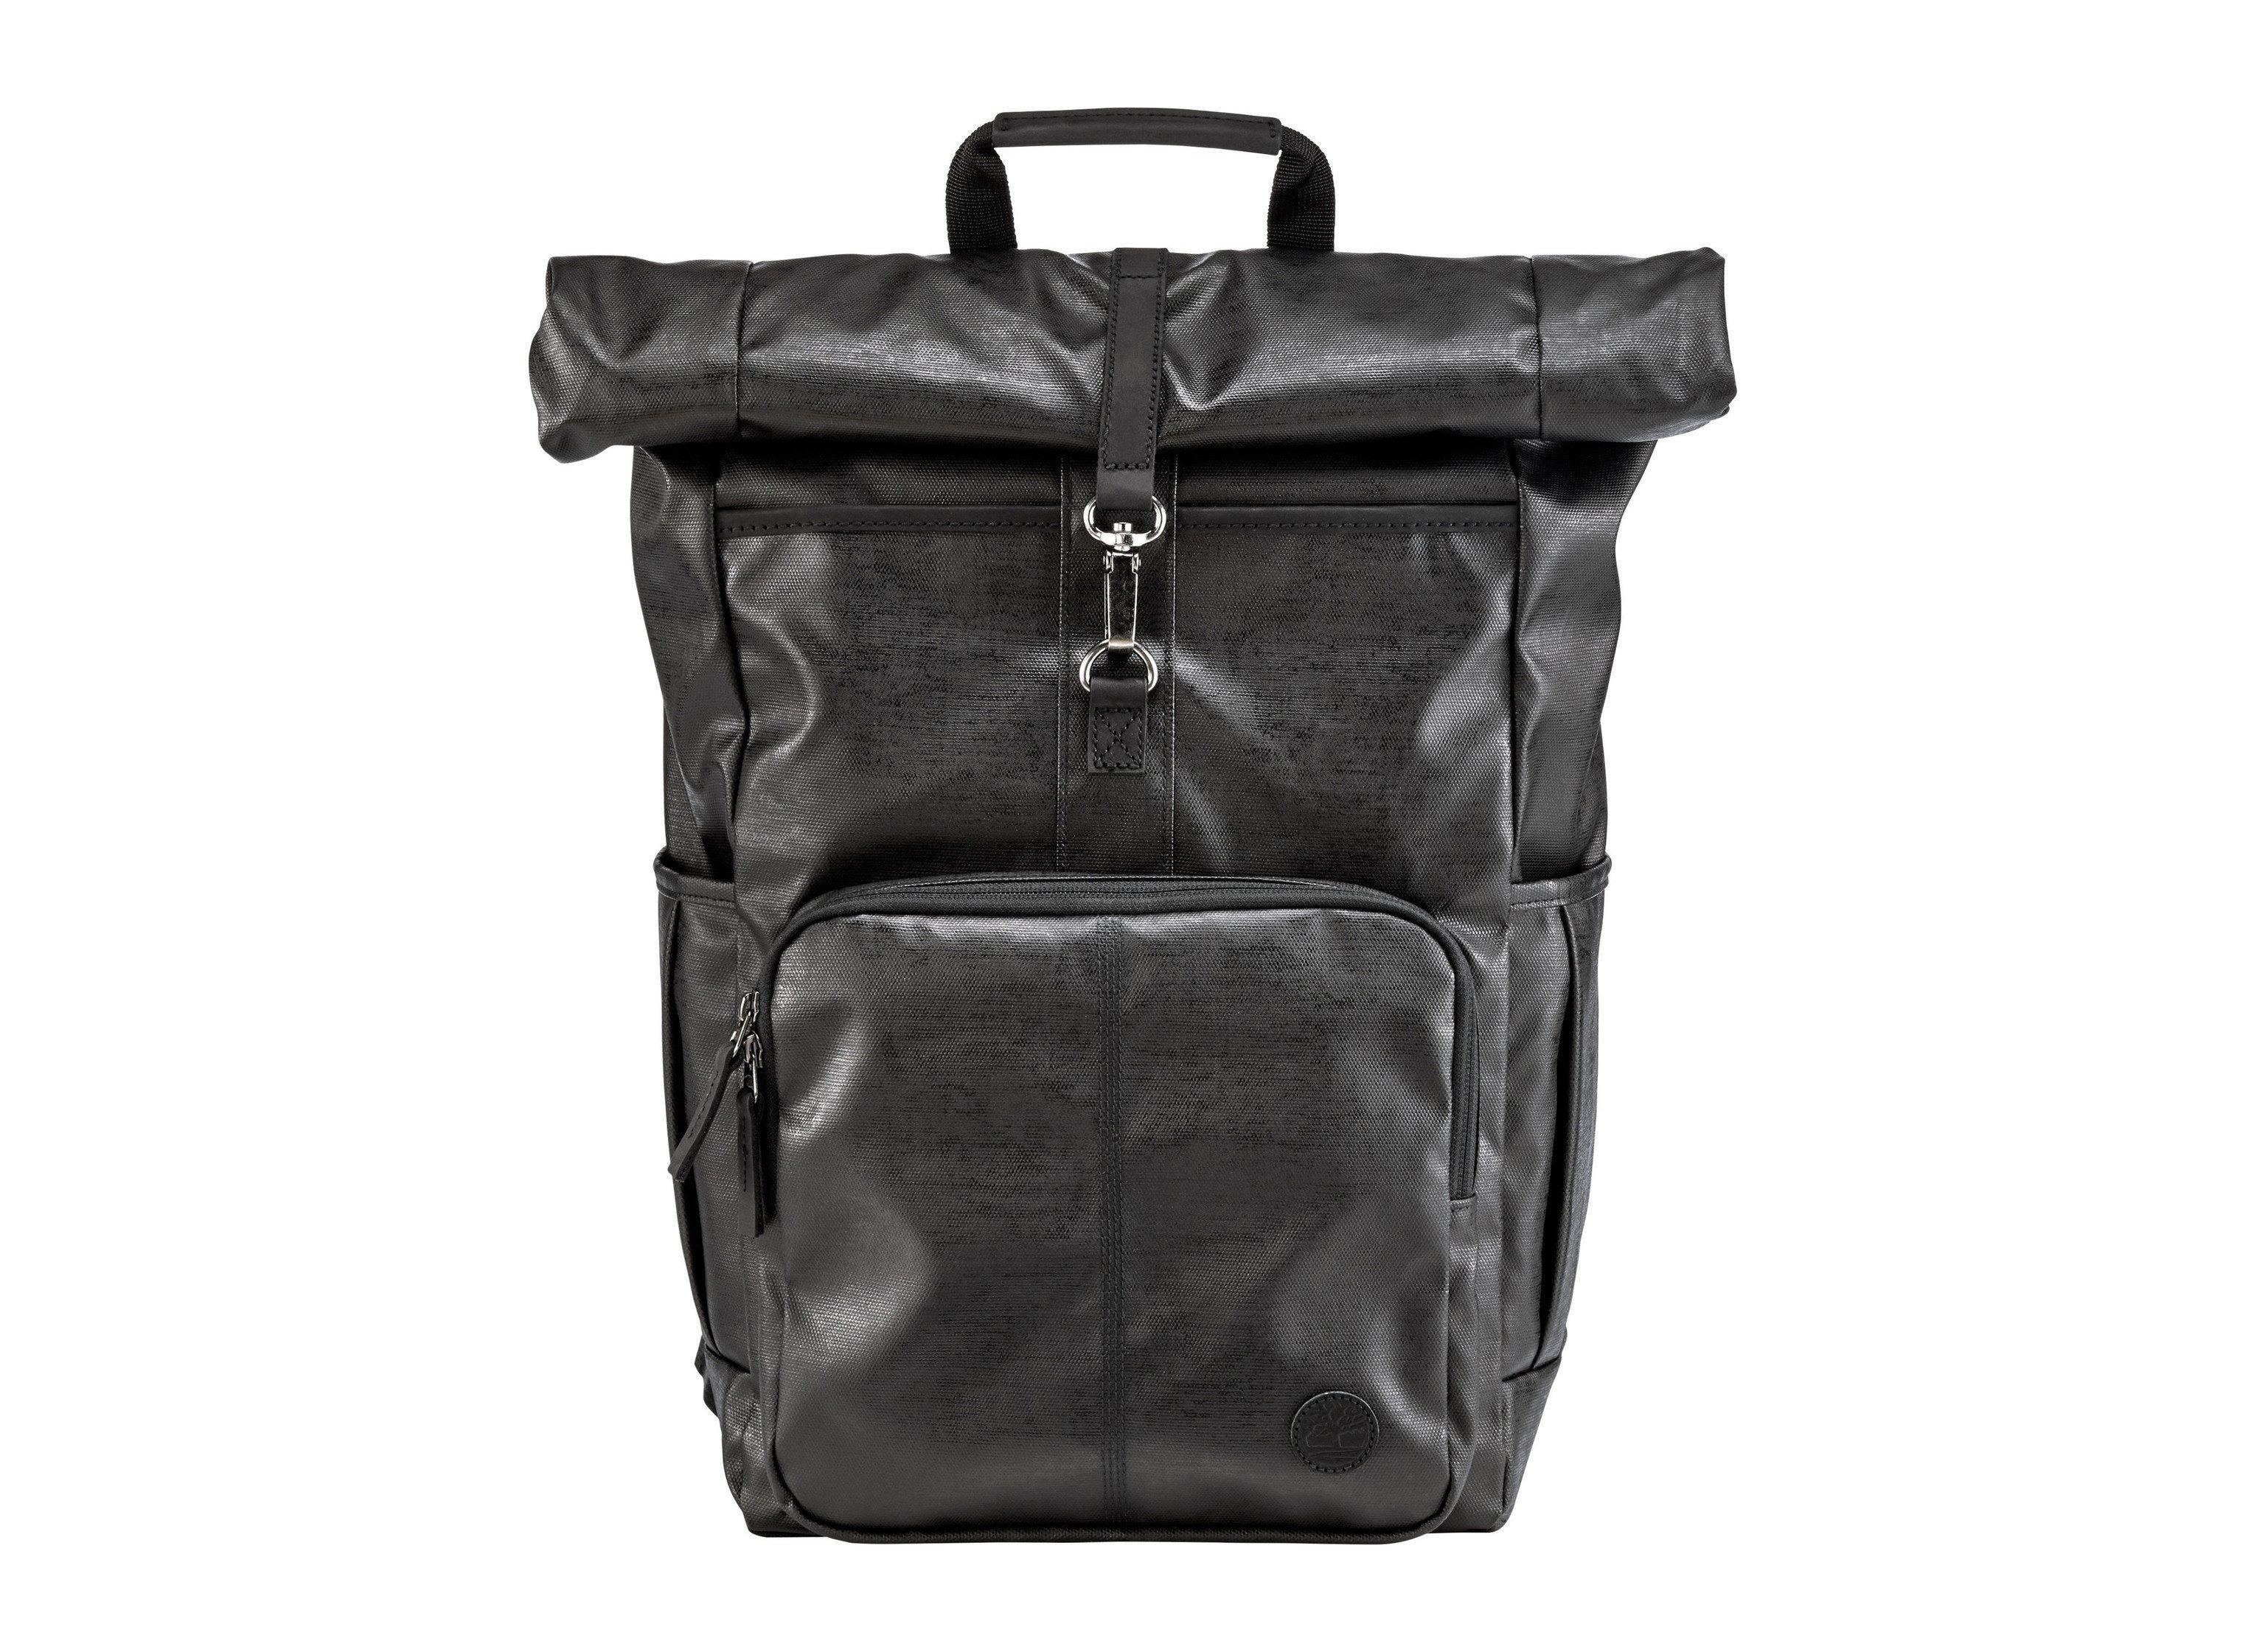 Style + Design bag black product handbag leather pocket shoulder bag product design accessory hand luggage luggage & bags brand